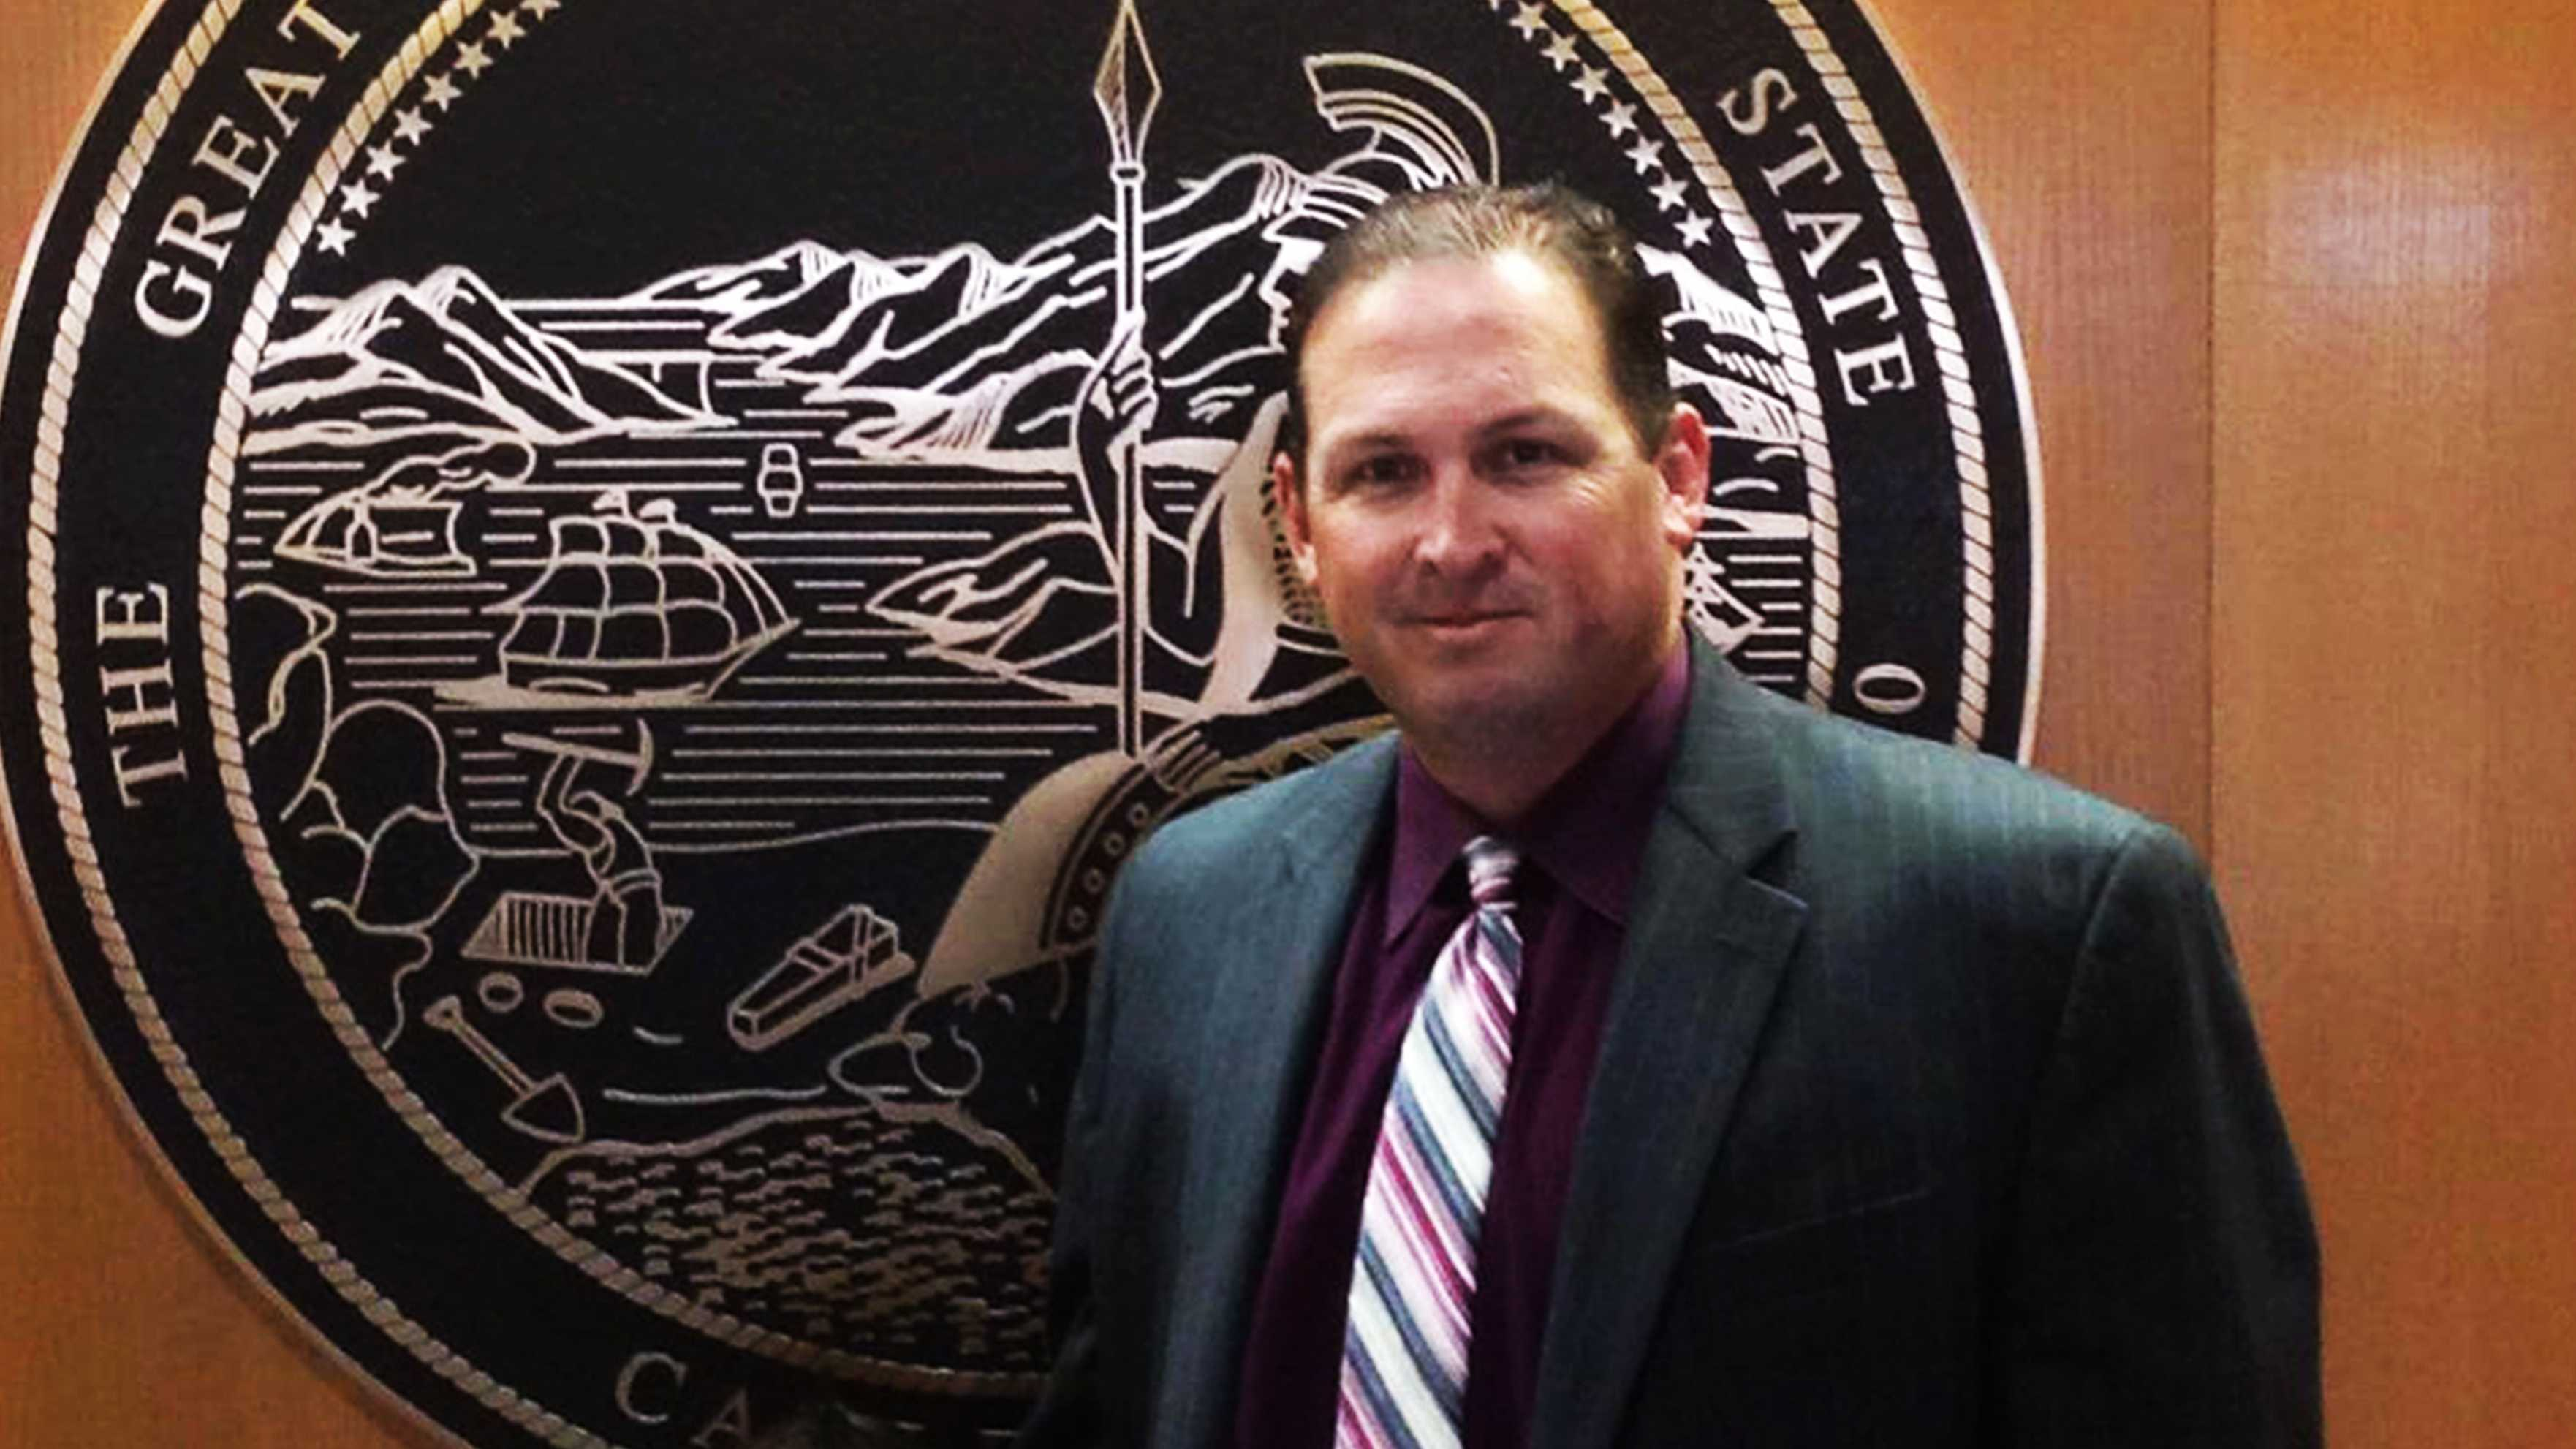 Hollister Police Chief David Westrick